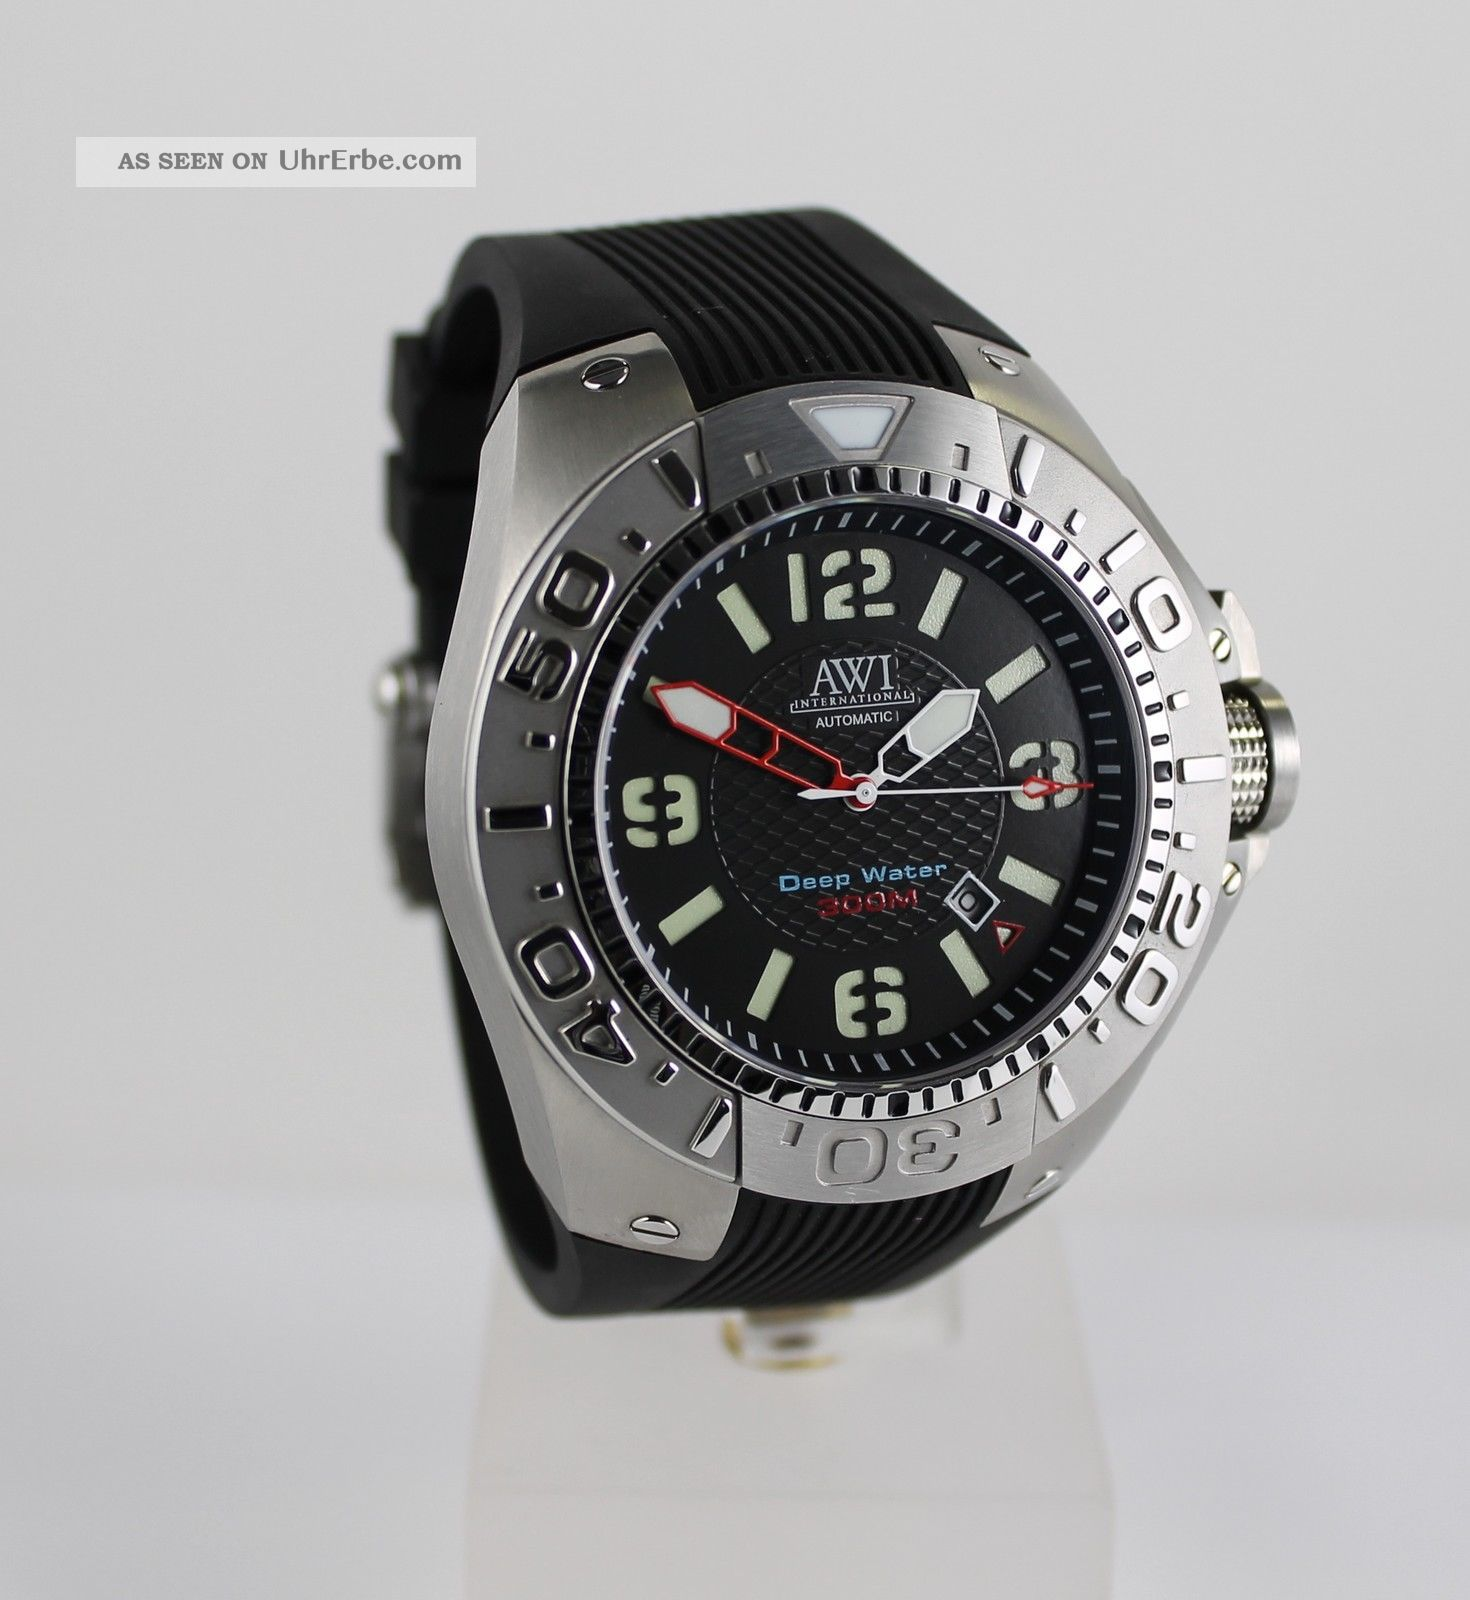 Awi Deep Water 50 Automatic Armbanduhren Bild